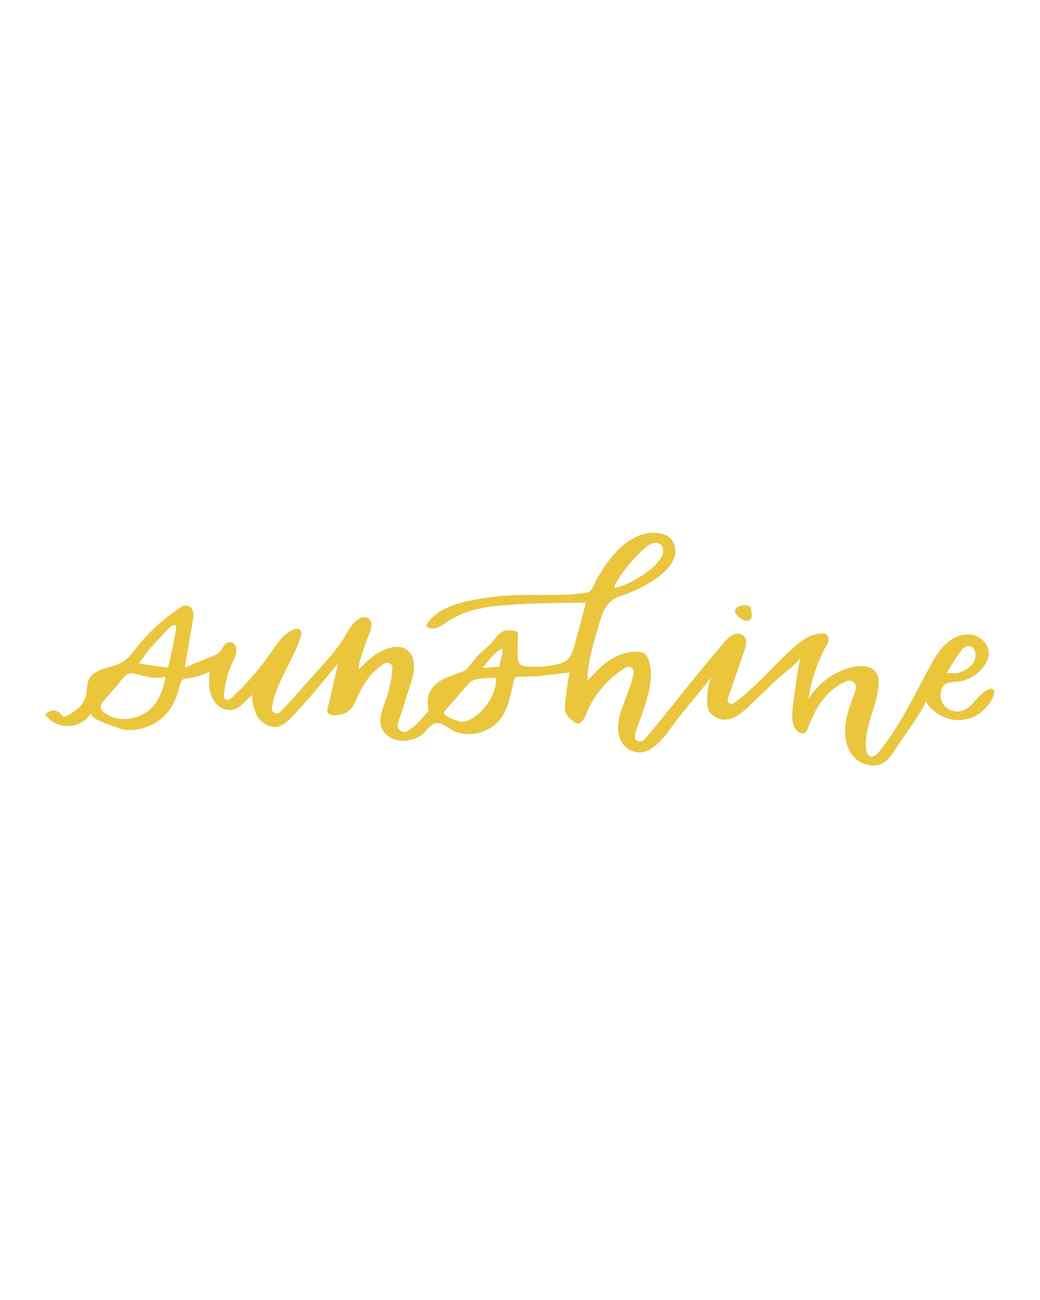 """sunshine"" calligraphy"